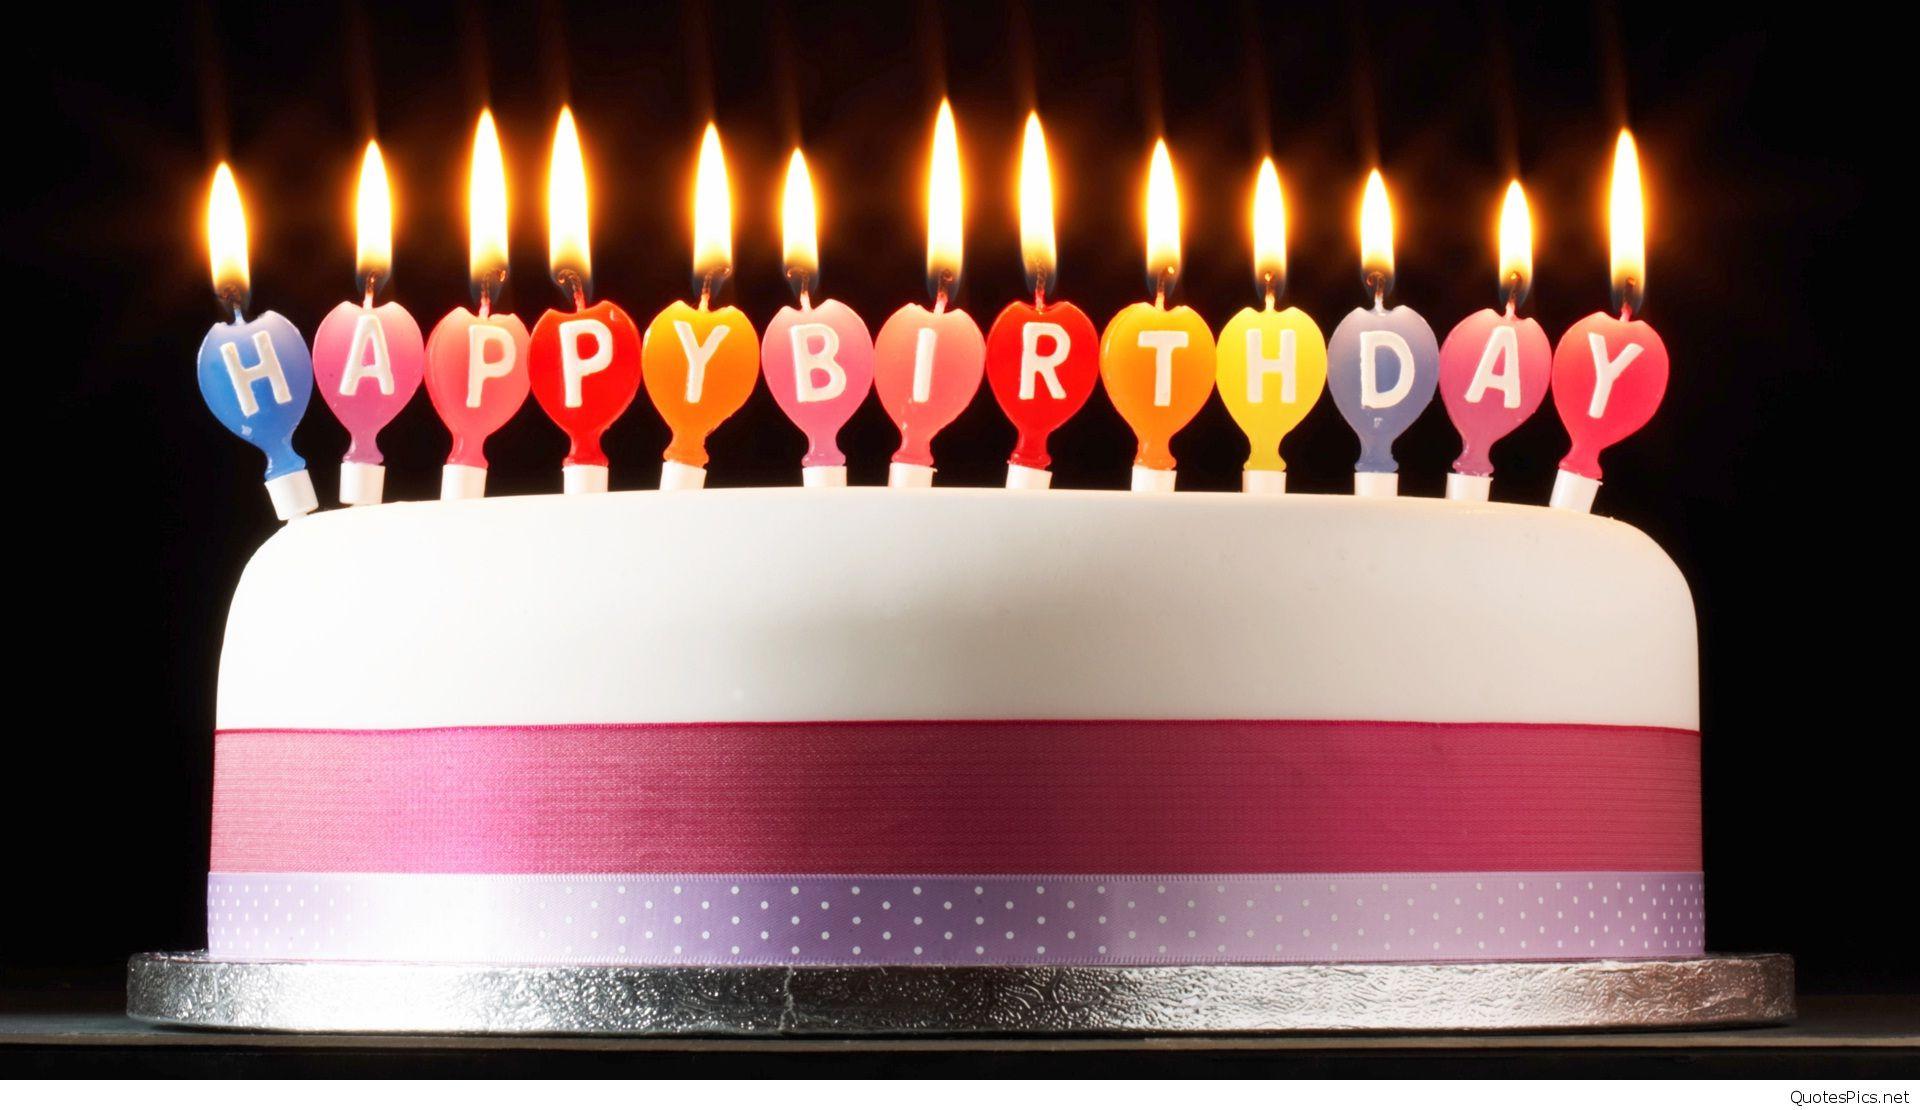 Birthday Cake Candles  Amazing Happy Birthday cake wallpapers hd